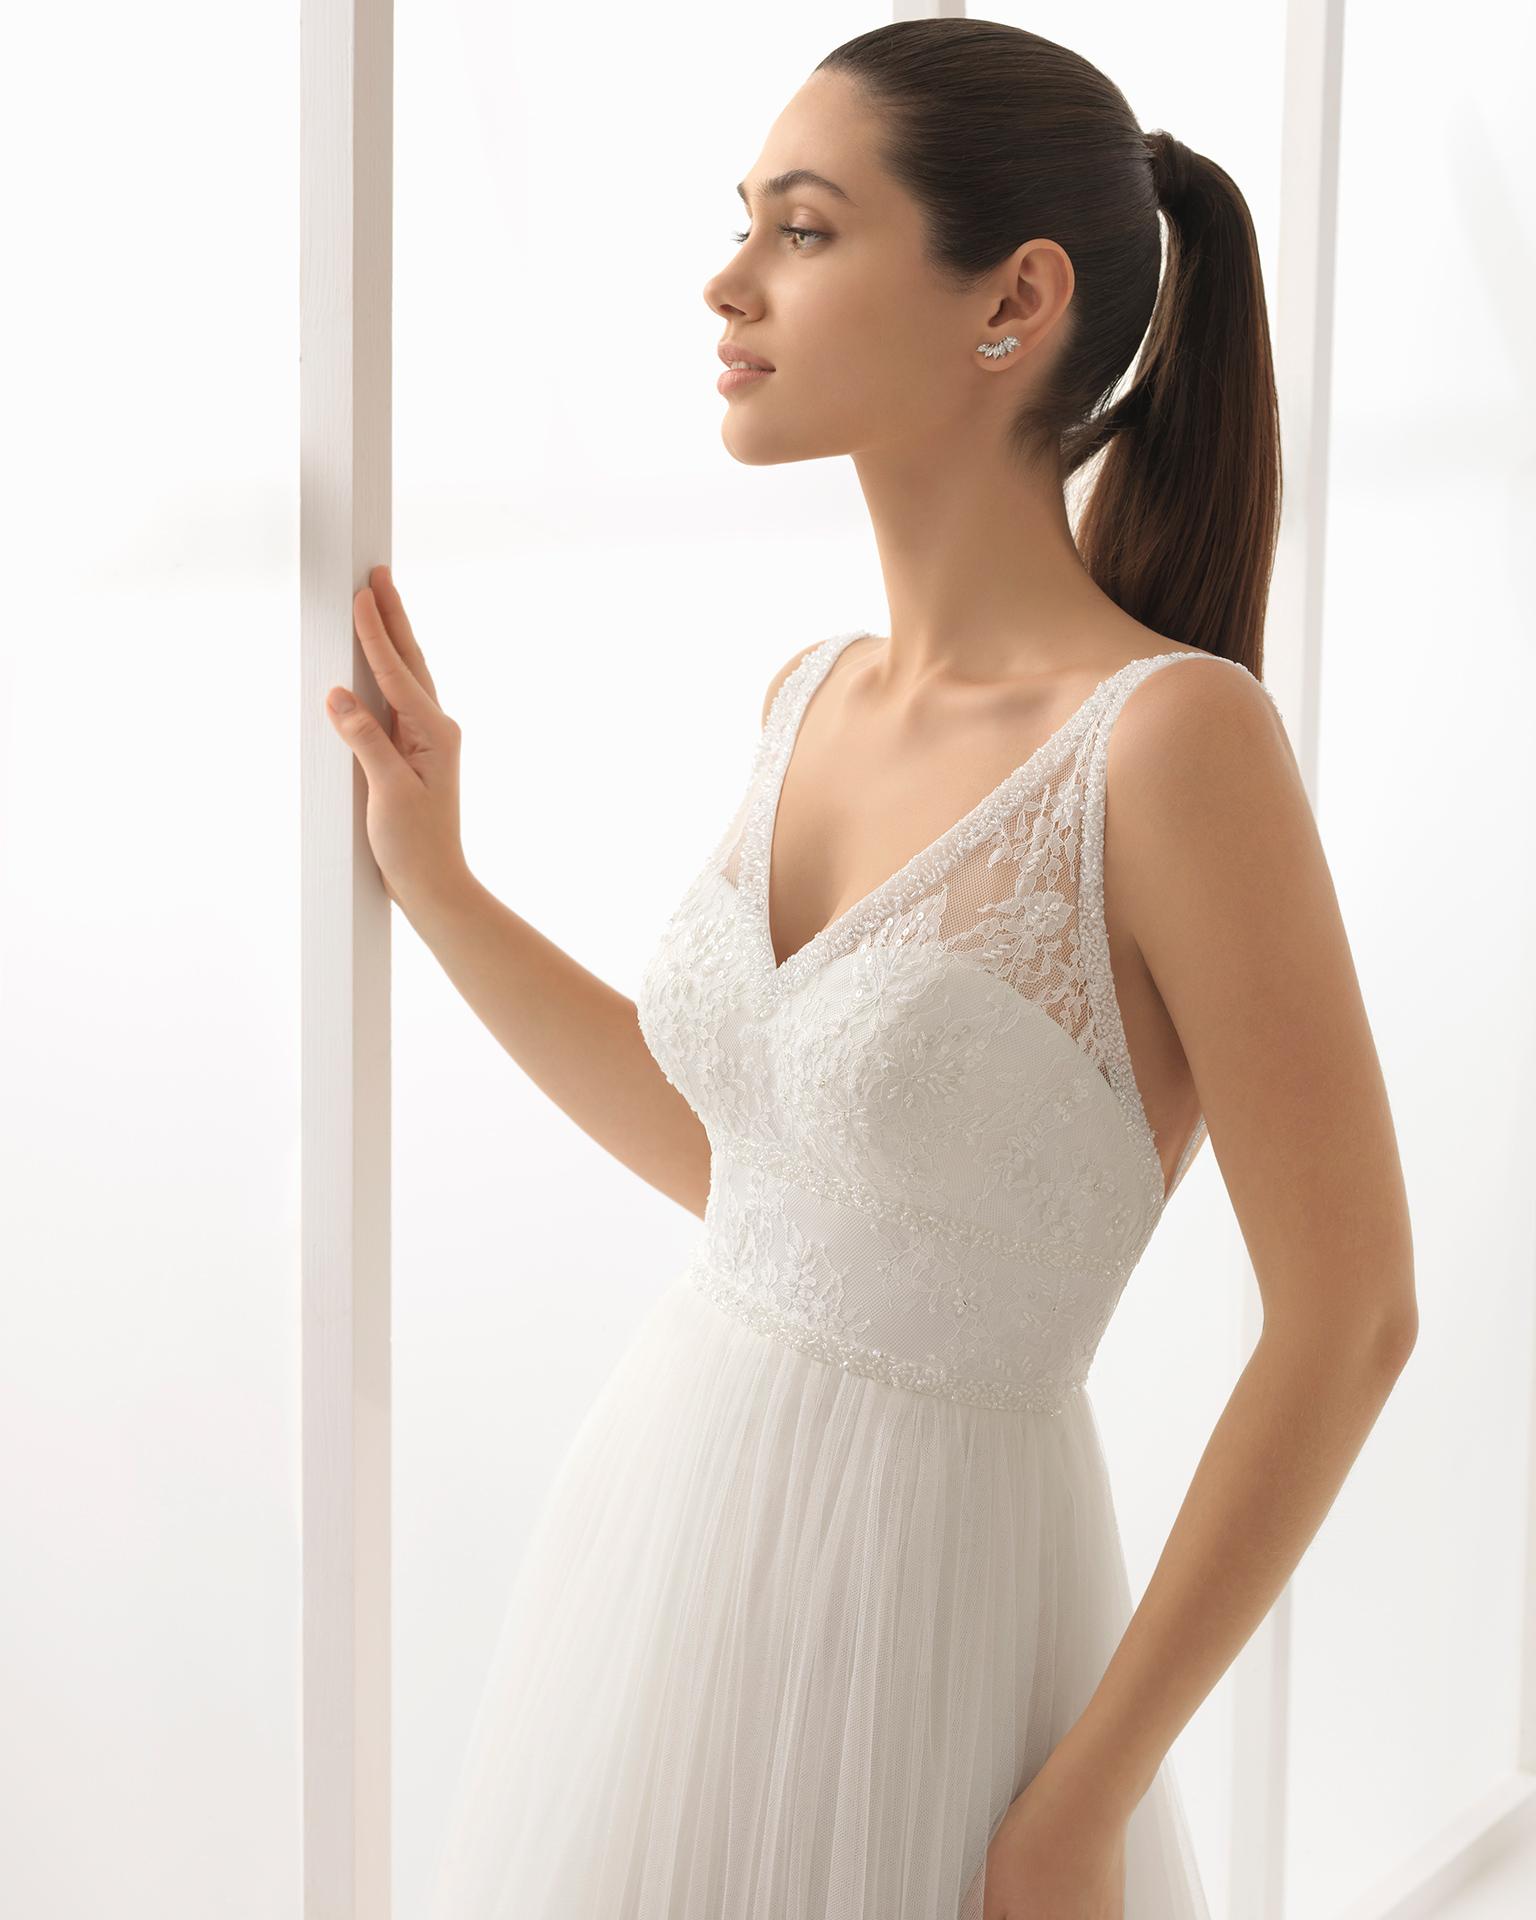 lisa 2018 bridal collection rosa clará soft collection